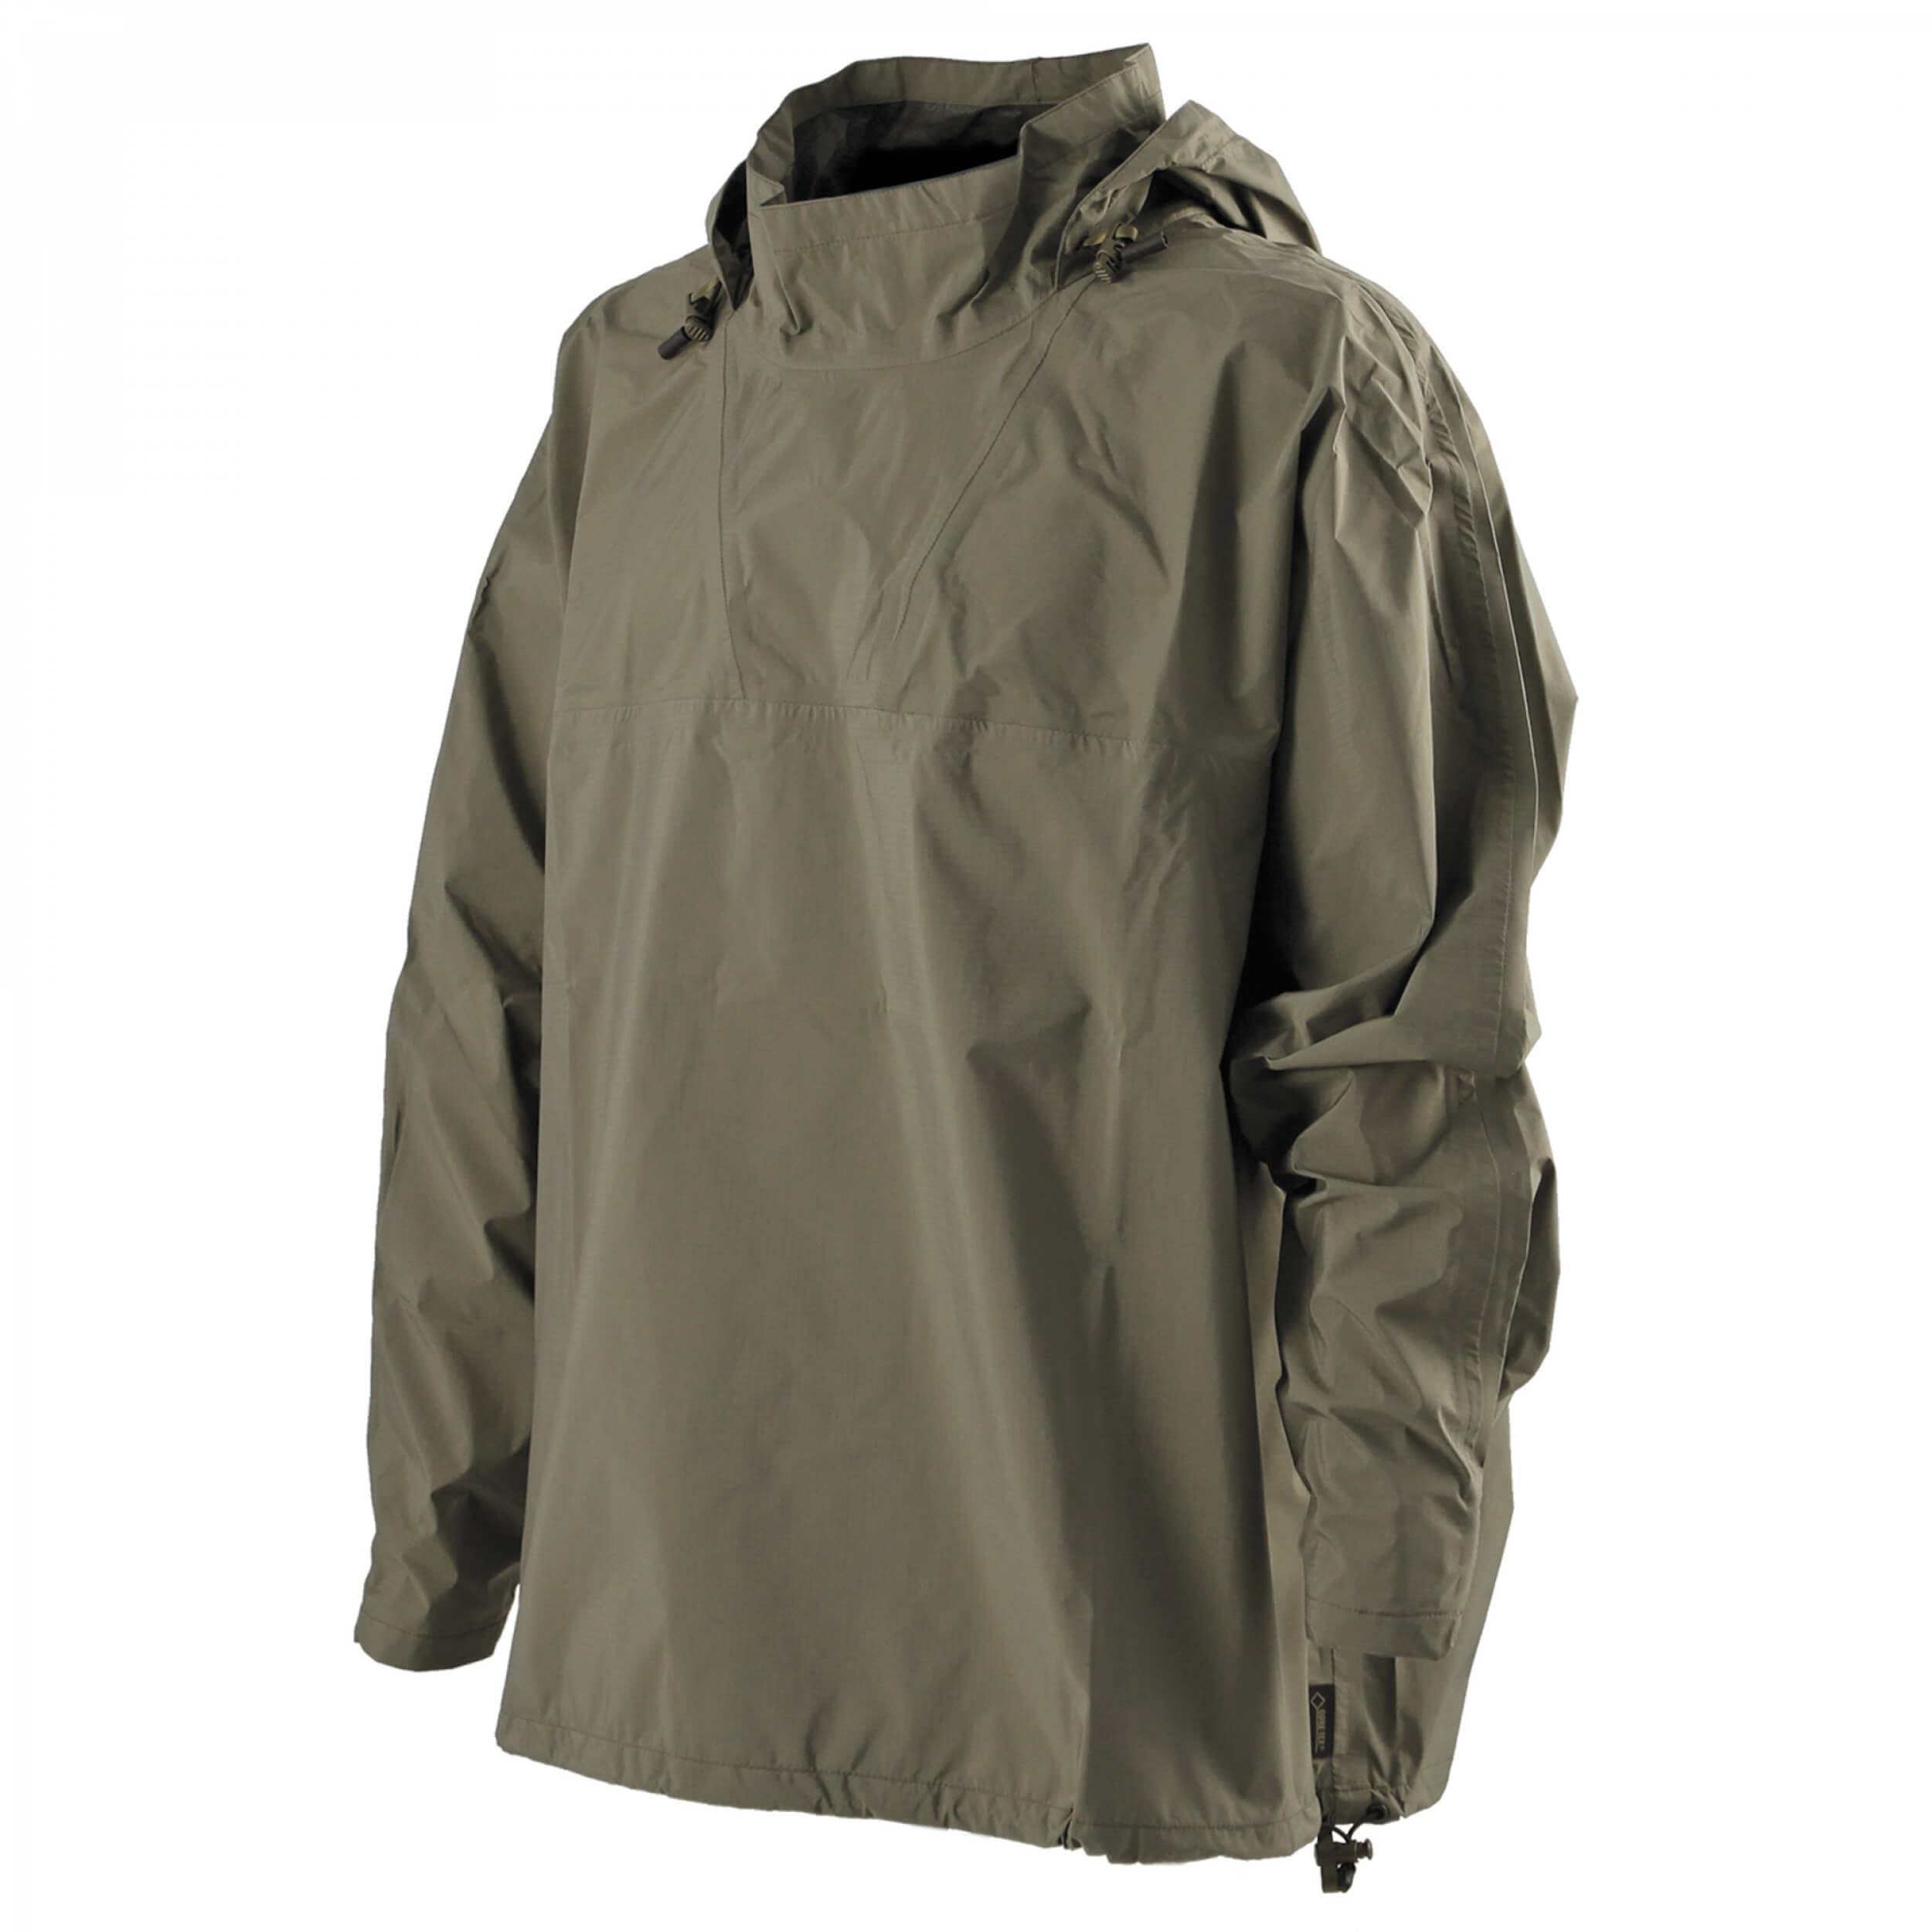 Carinthia Survival Rainsuite Jacket oliv